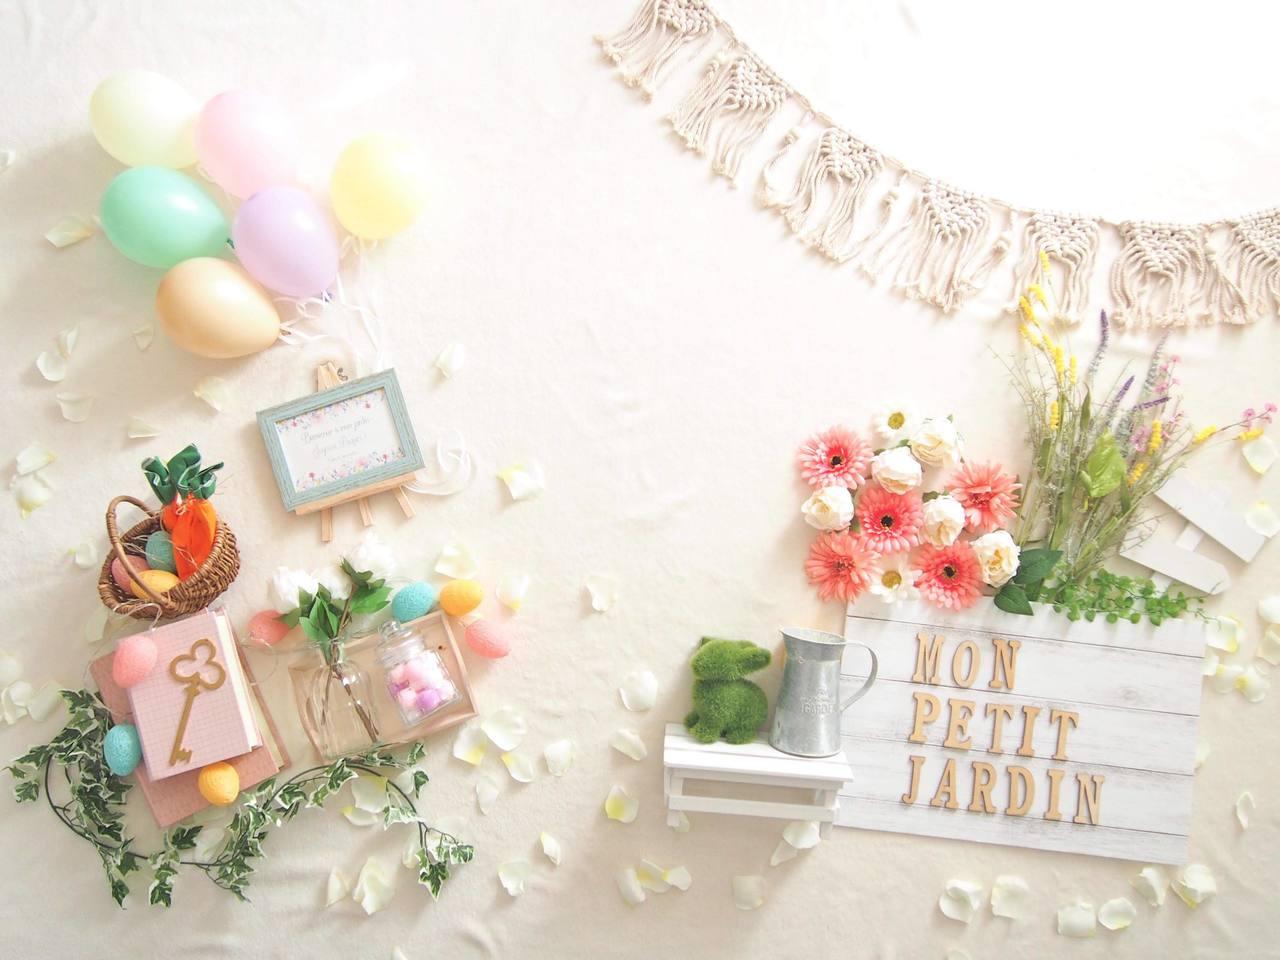 2/28 maman marche 【ねんねアートフォトブース】- mon petit jardin -